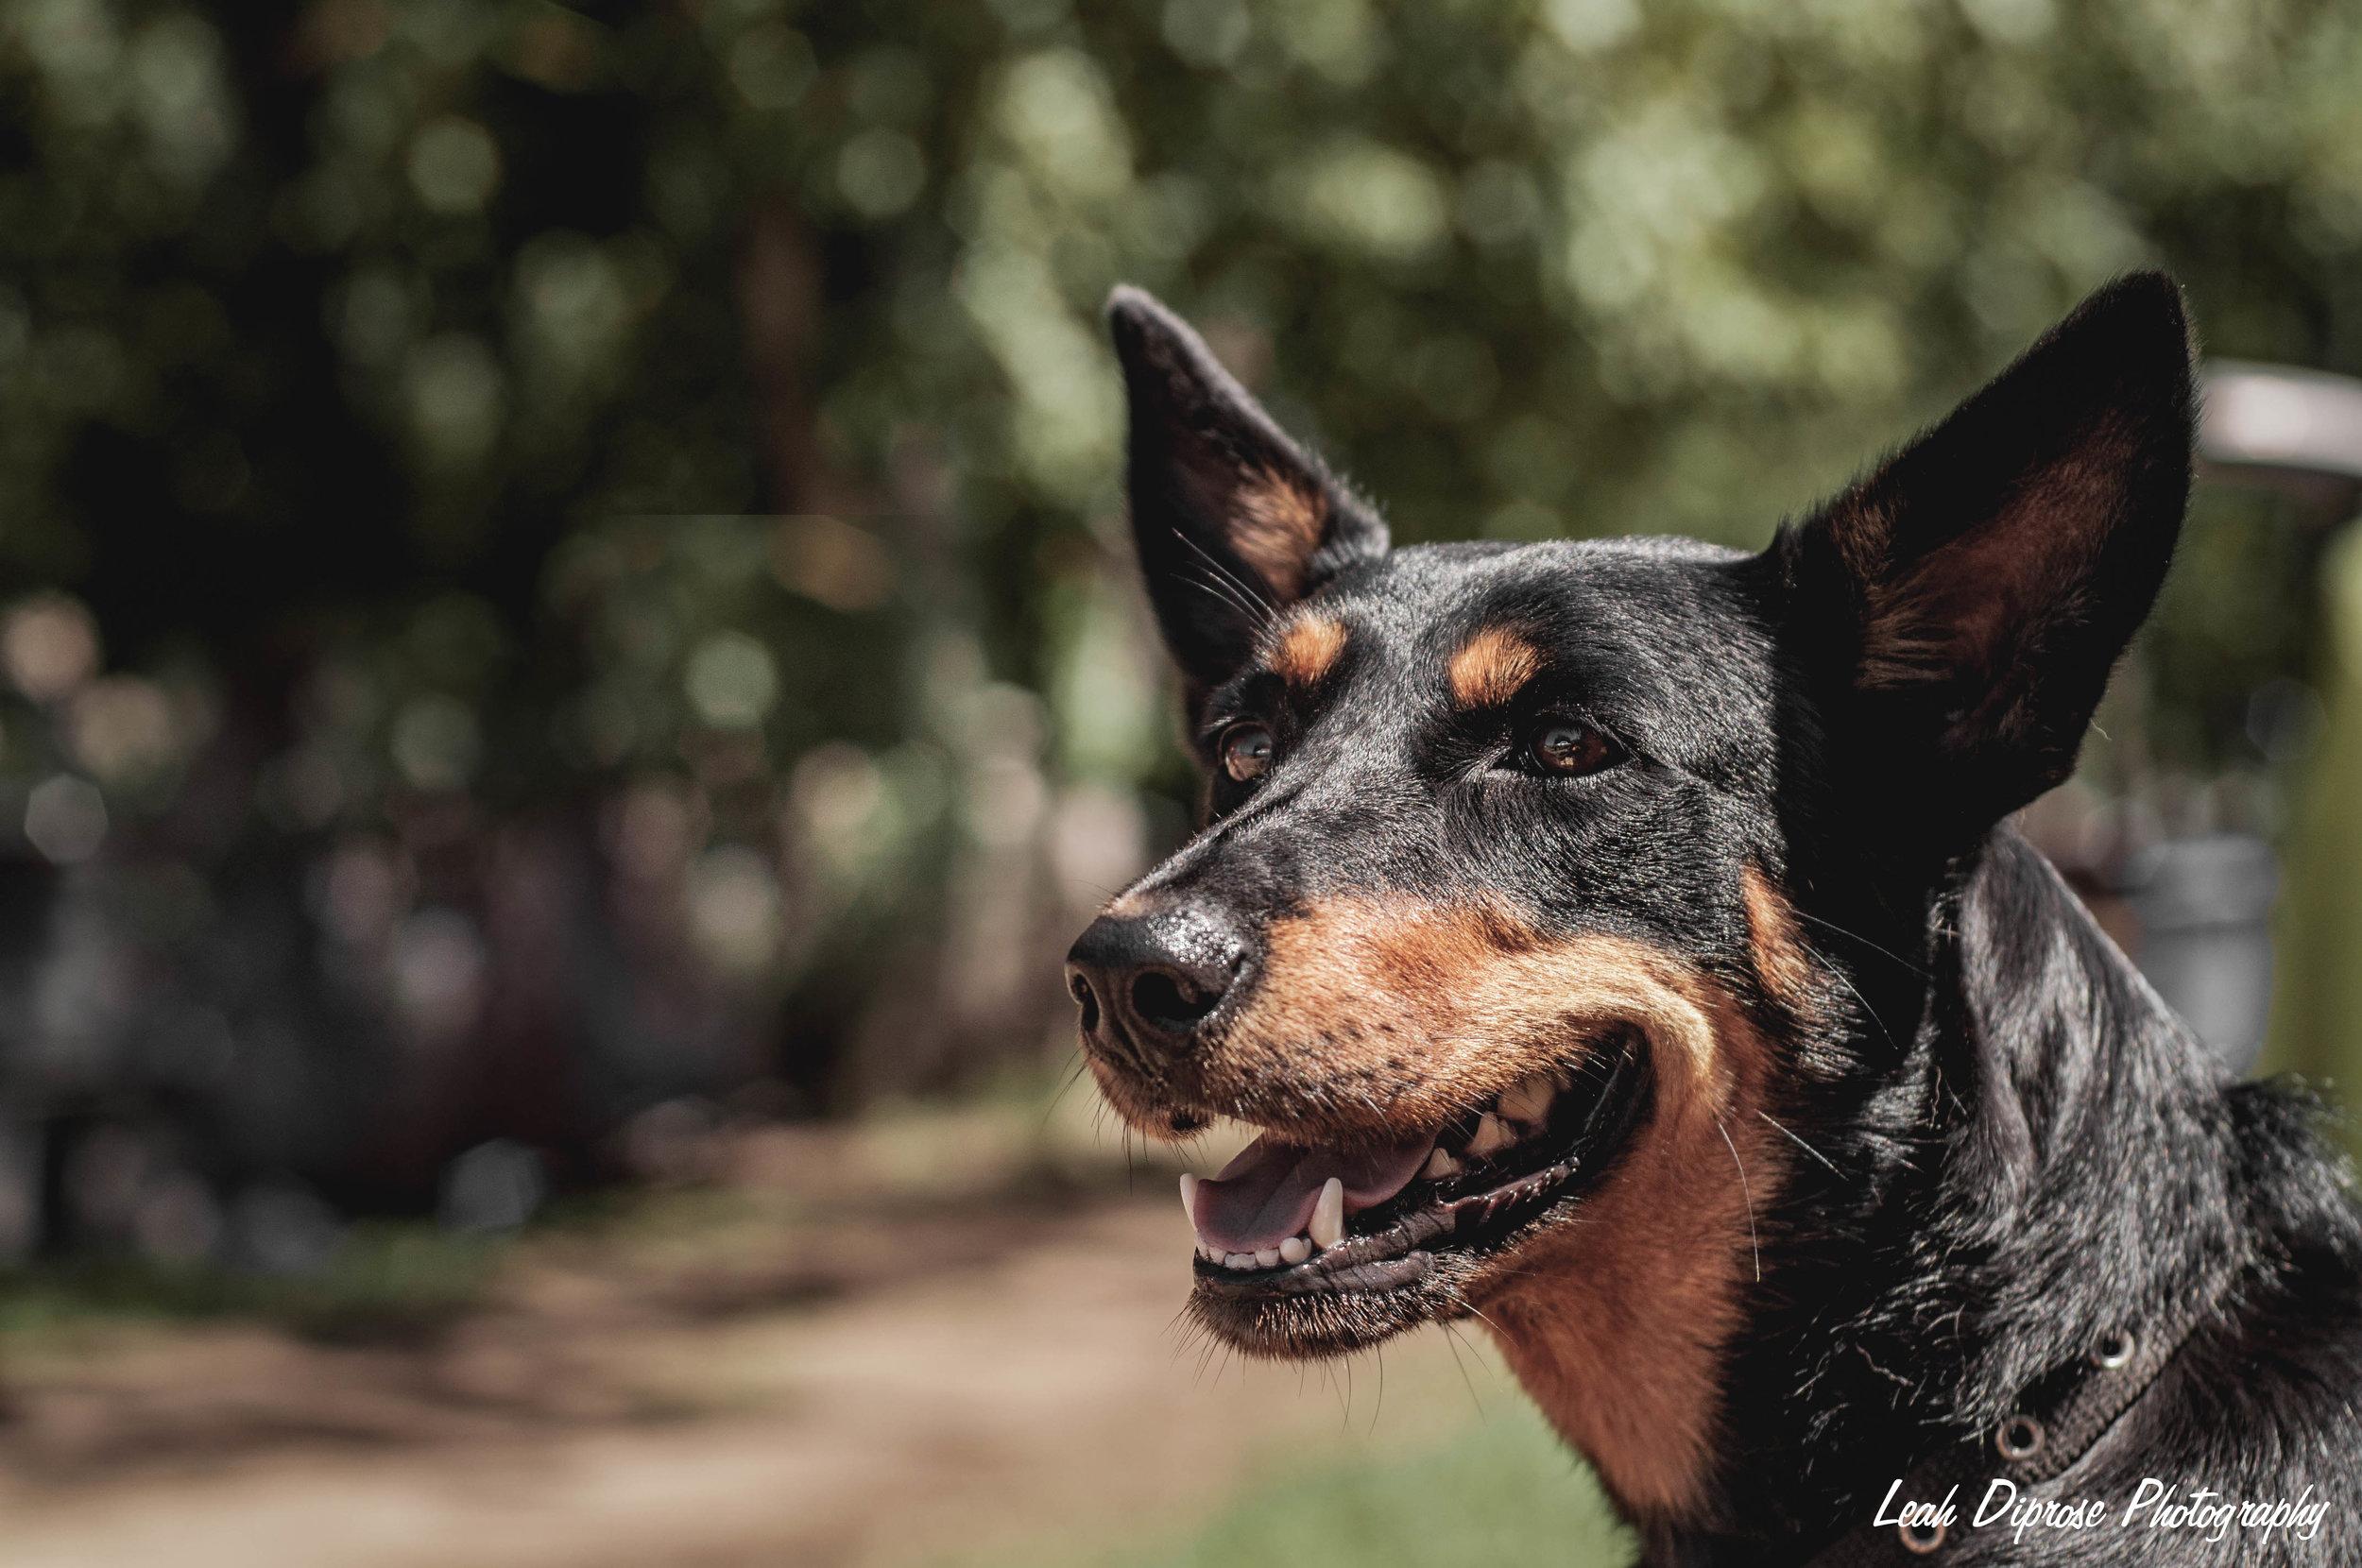 Leah Diprose Photography image-6208.jpg